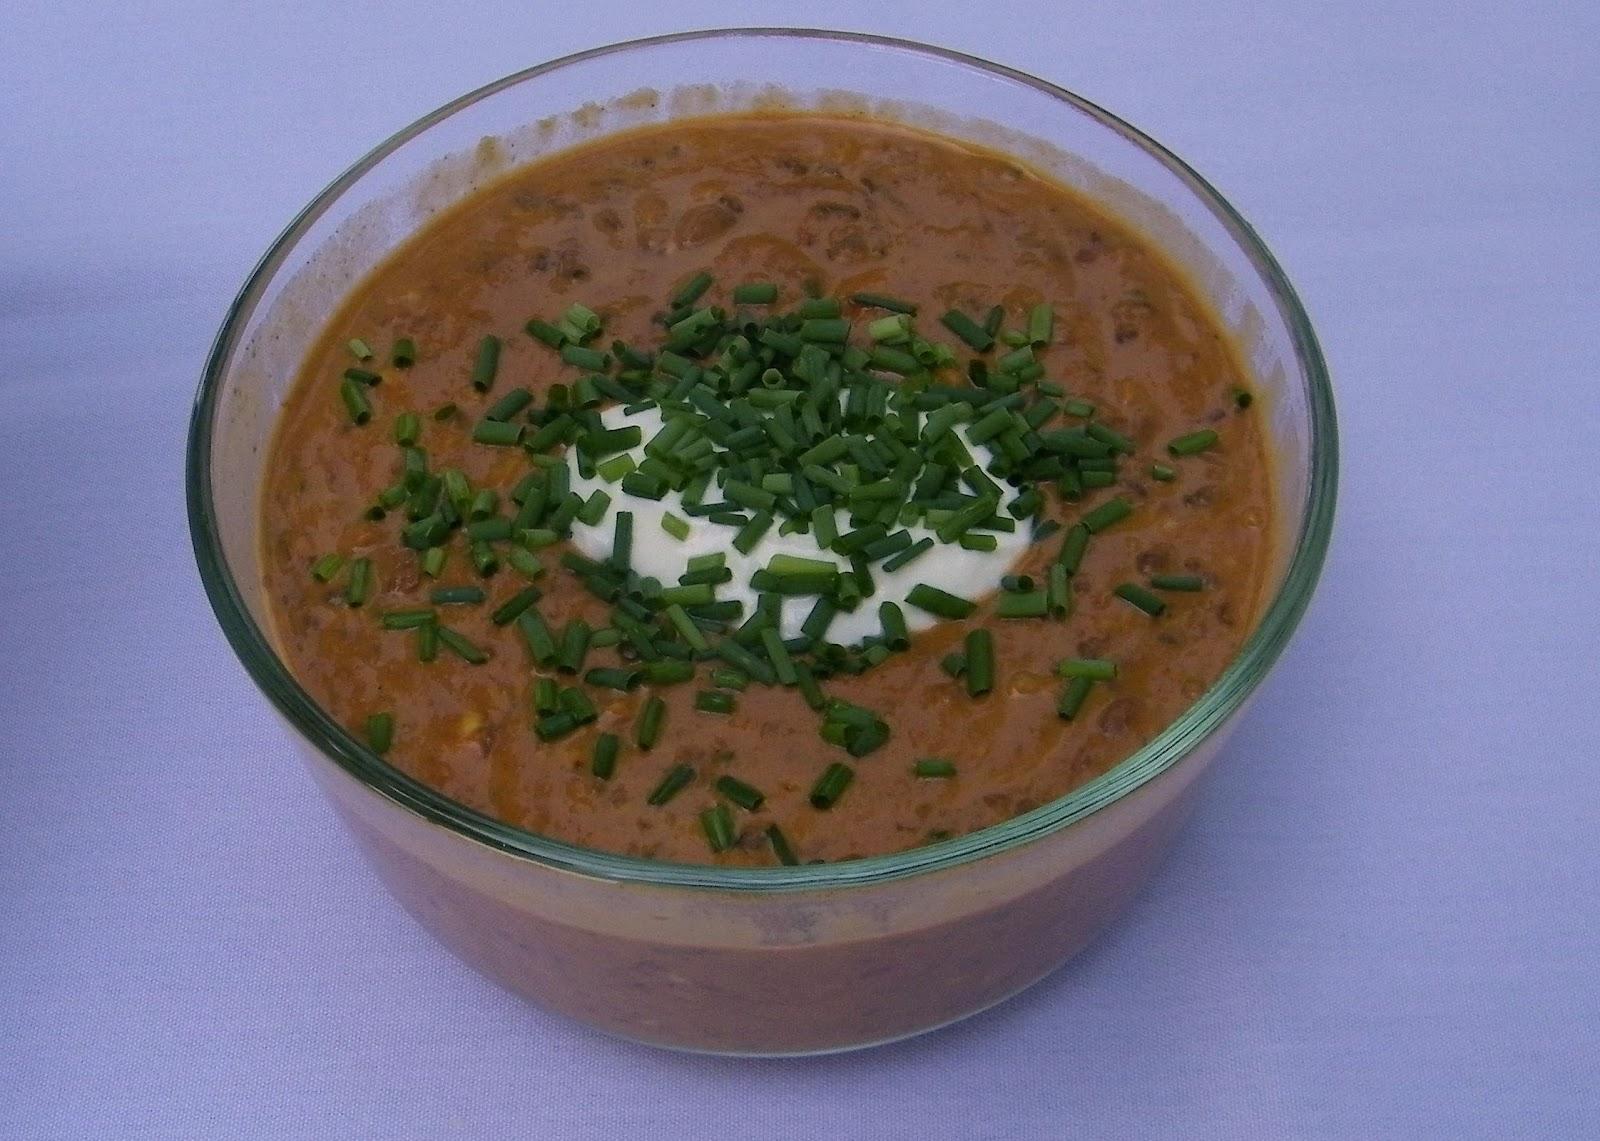 Costco Cuisine Tasty Bites Madras Lentil Dip And A New Link